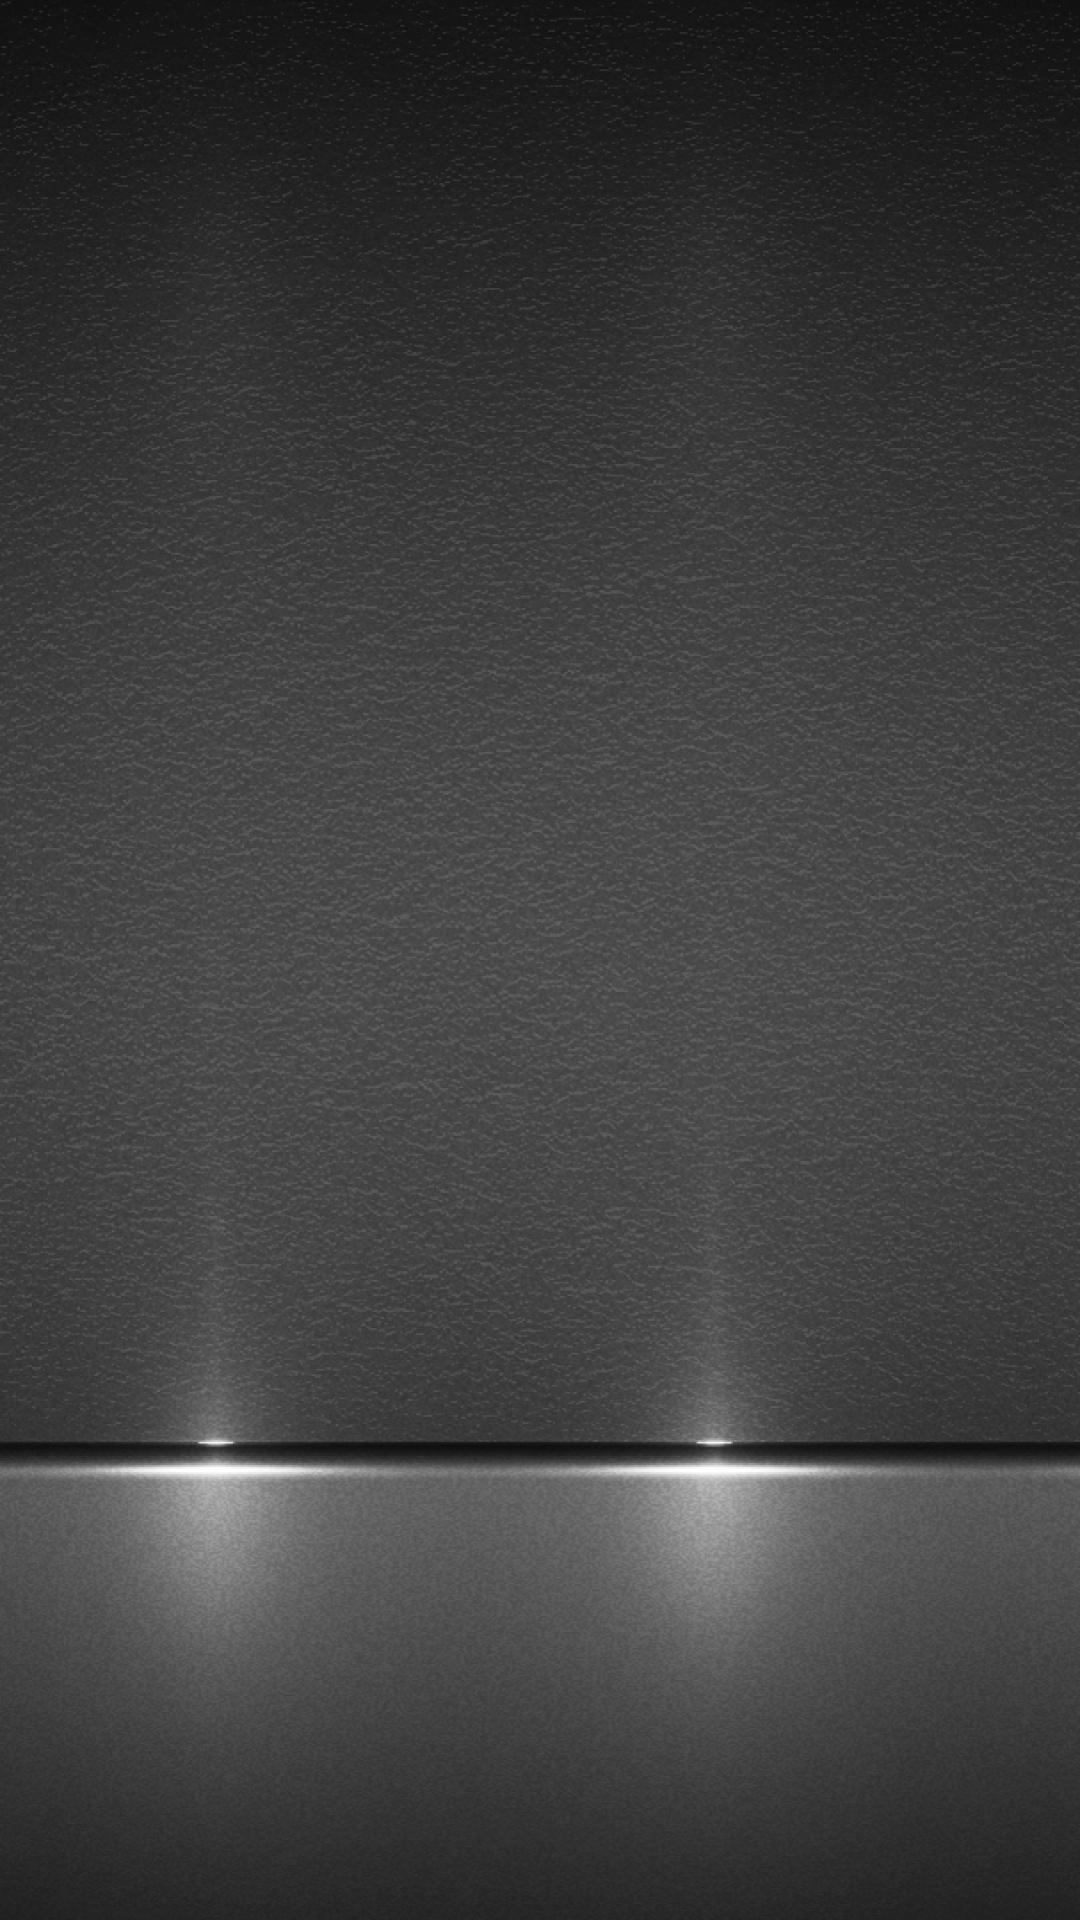 Line light surface texture